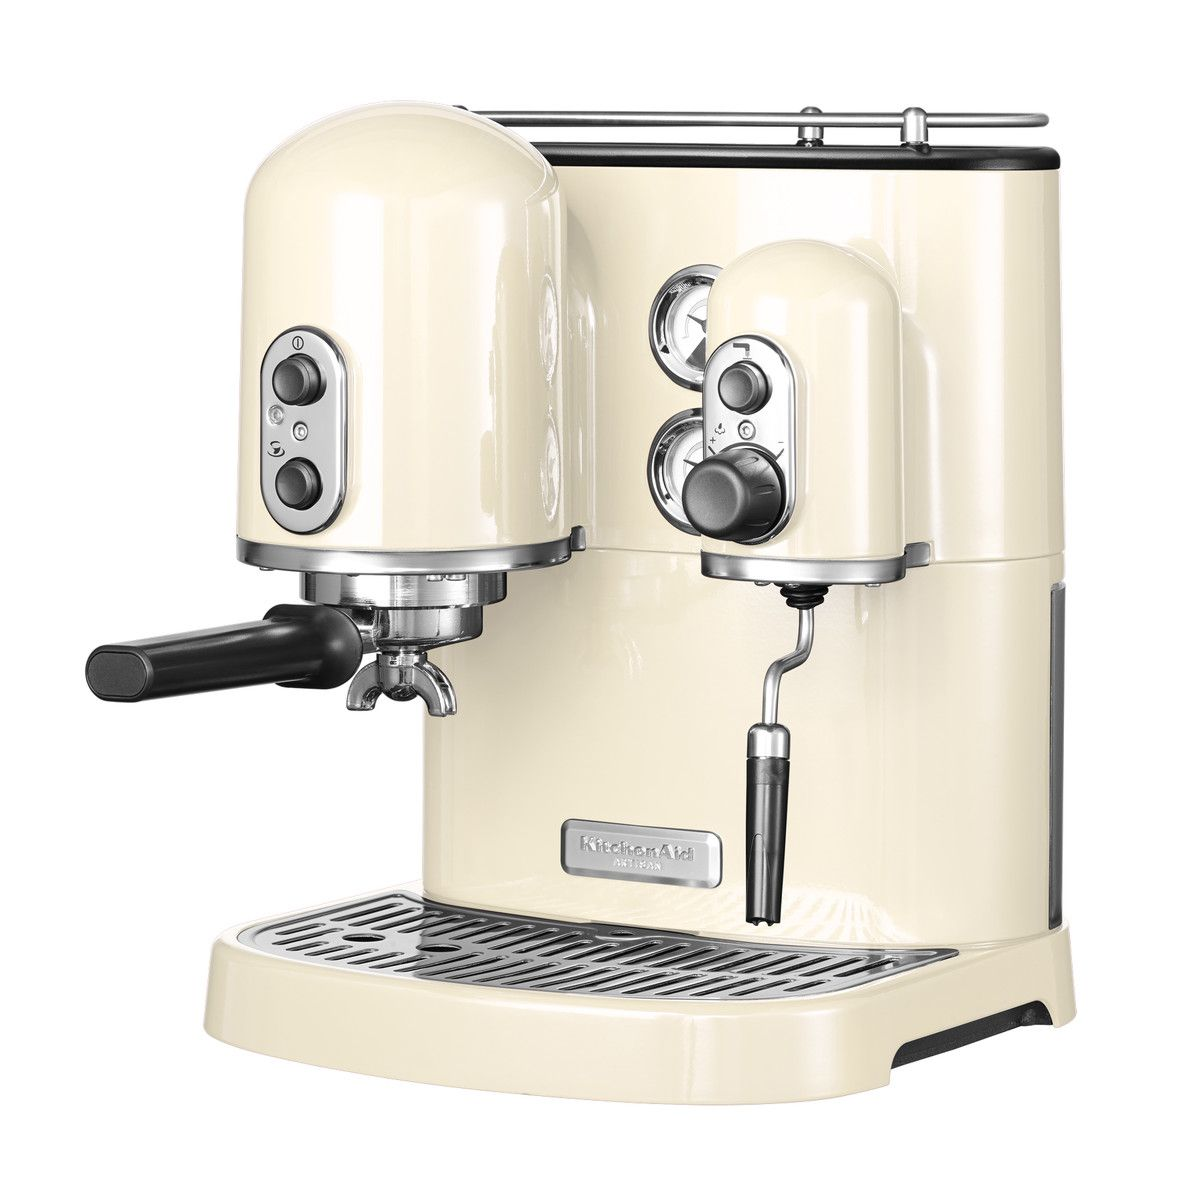 KitchenAid - Artisan Espressomaschine, crème | Espressomaschine ...